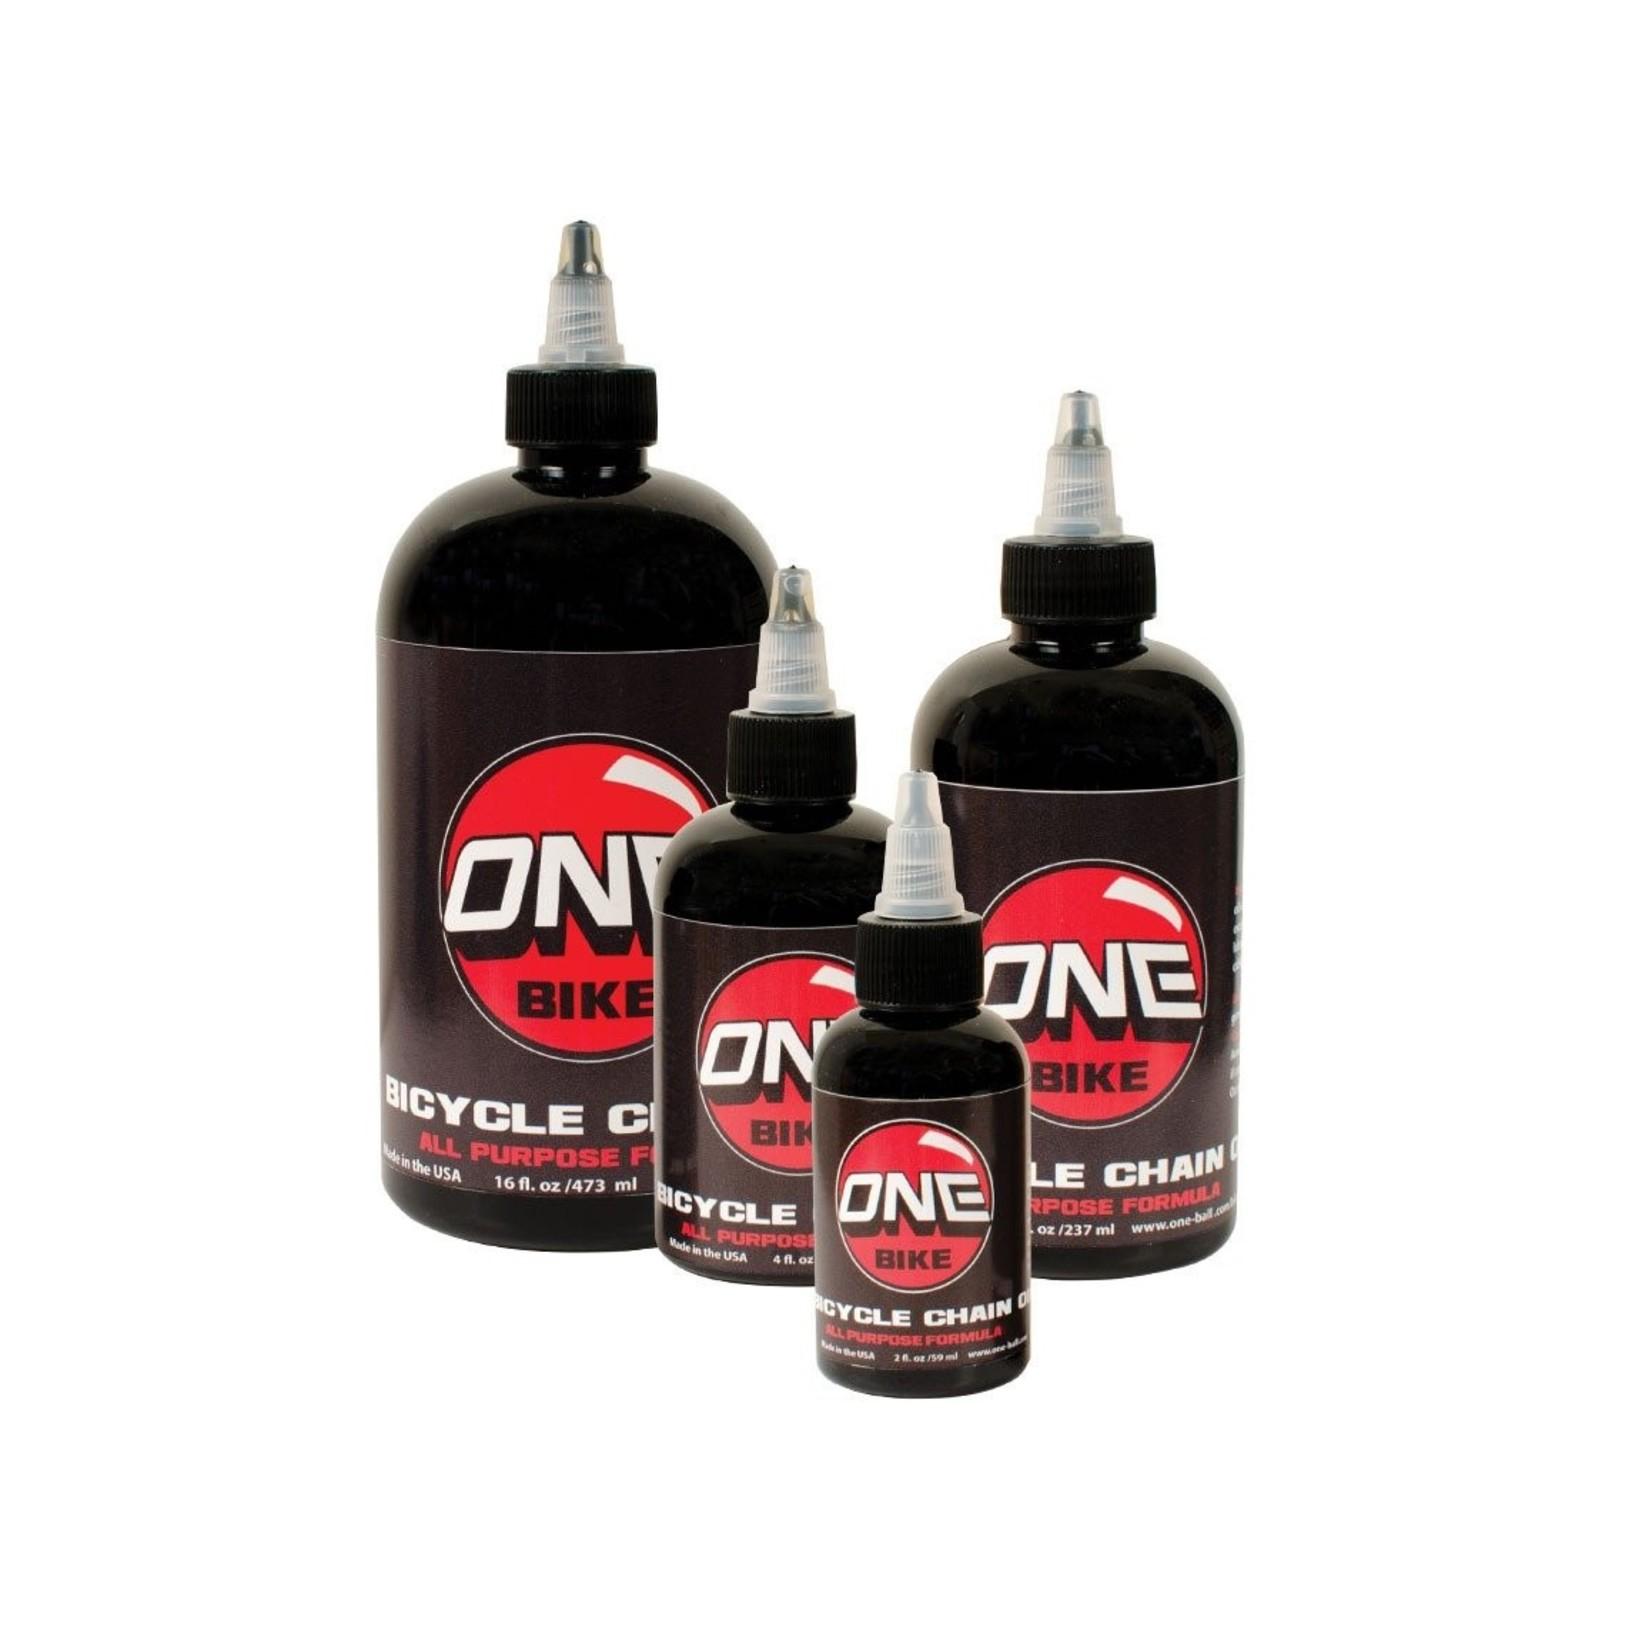 One Ball Oil All Purpose - 2oz